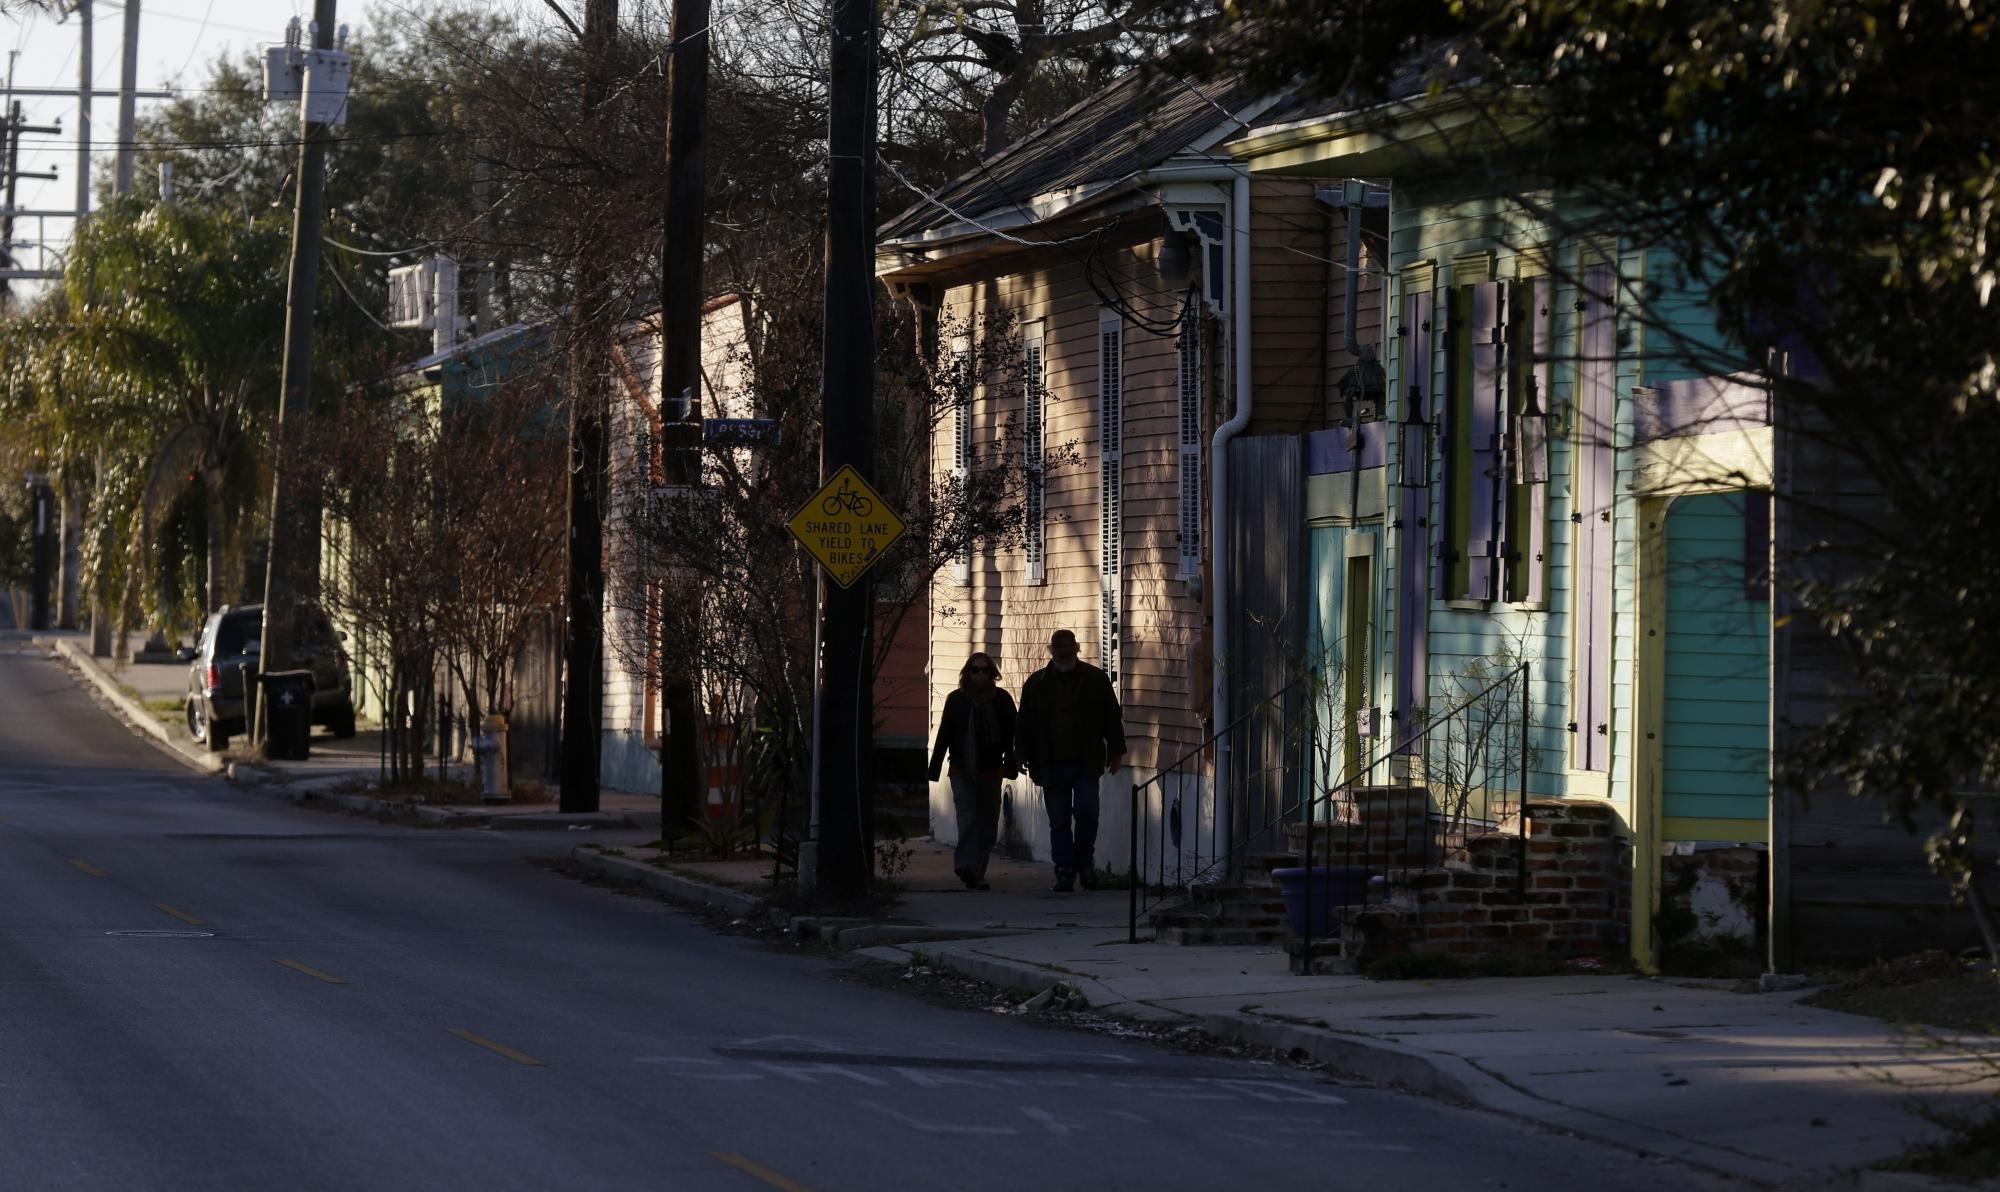 New Orleans Council Backs Strong Short-term Rental Limits